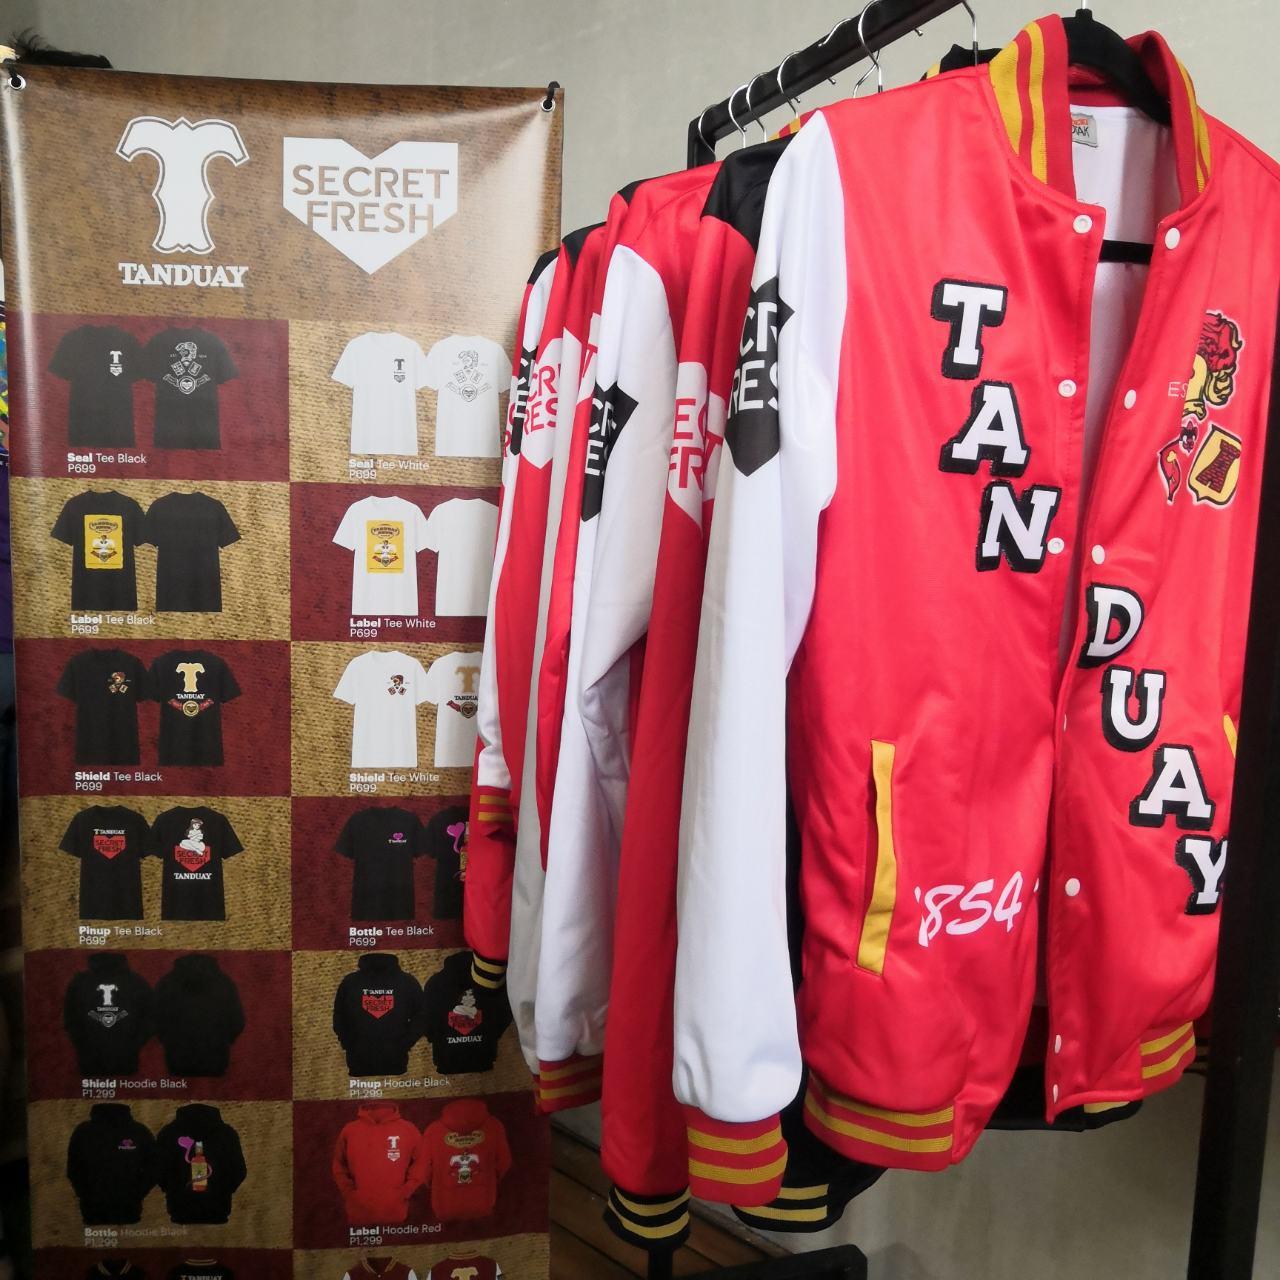 Tanduay x Secret Fresh collection